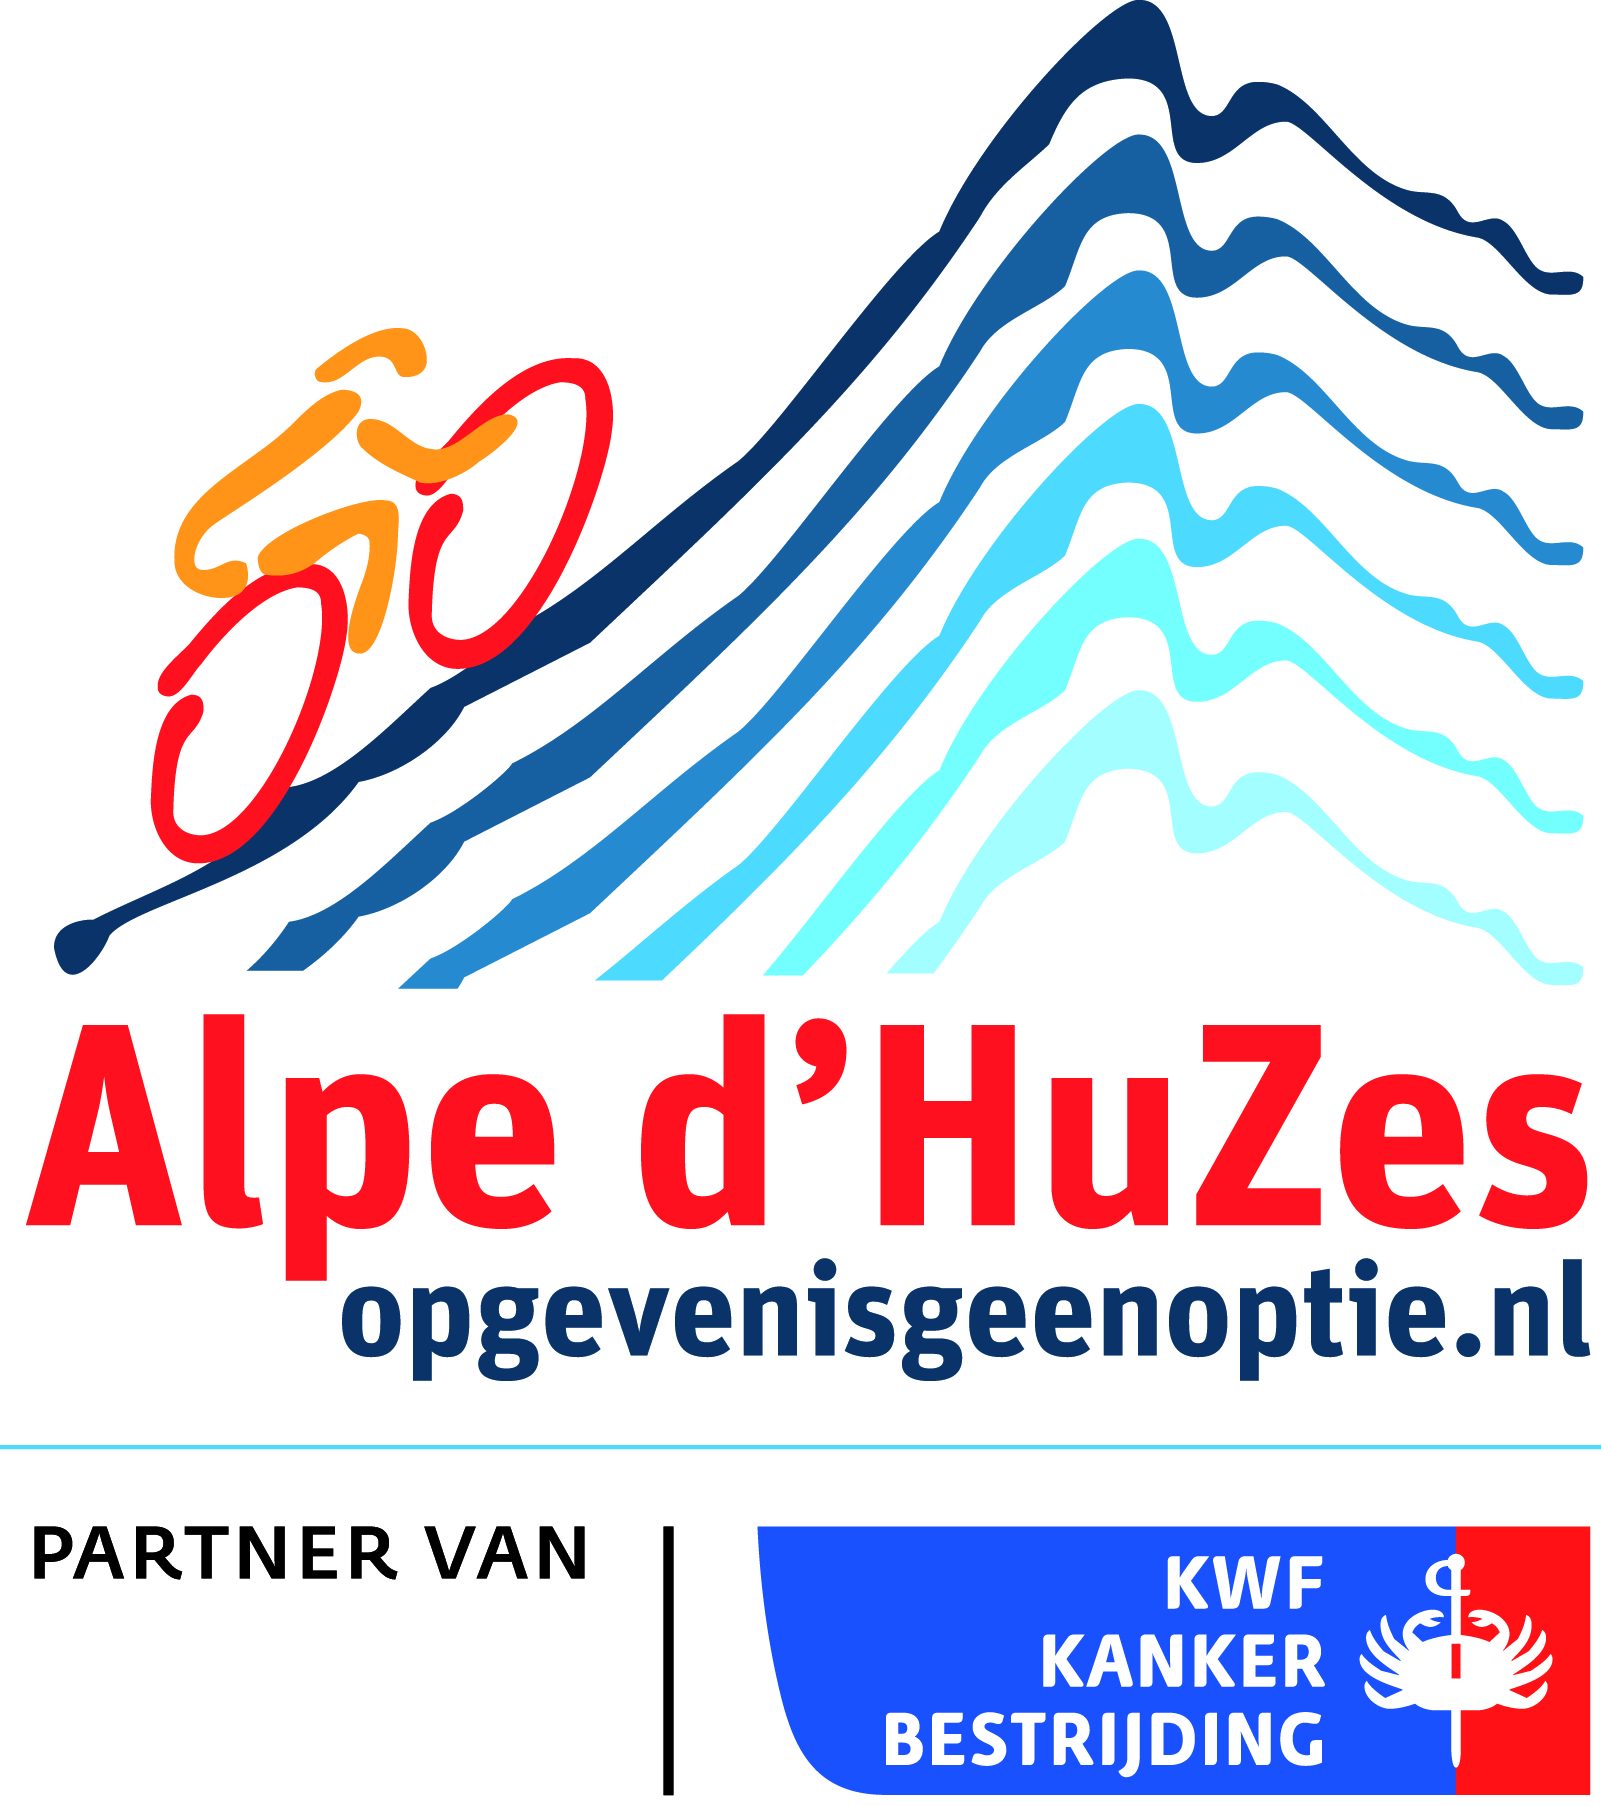 Alpe d'HuZes_4